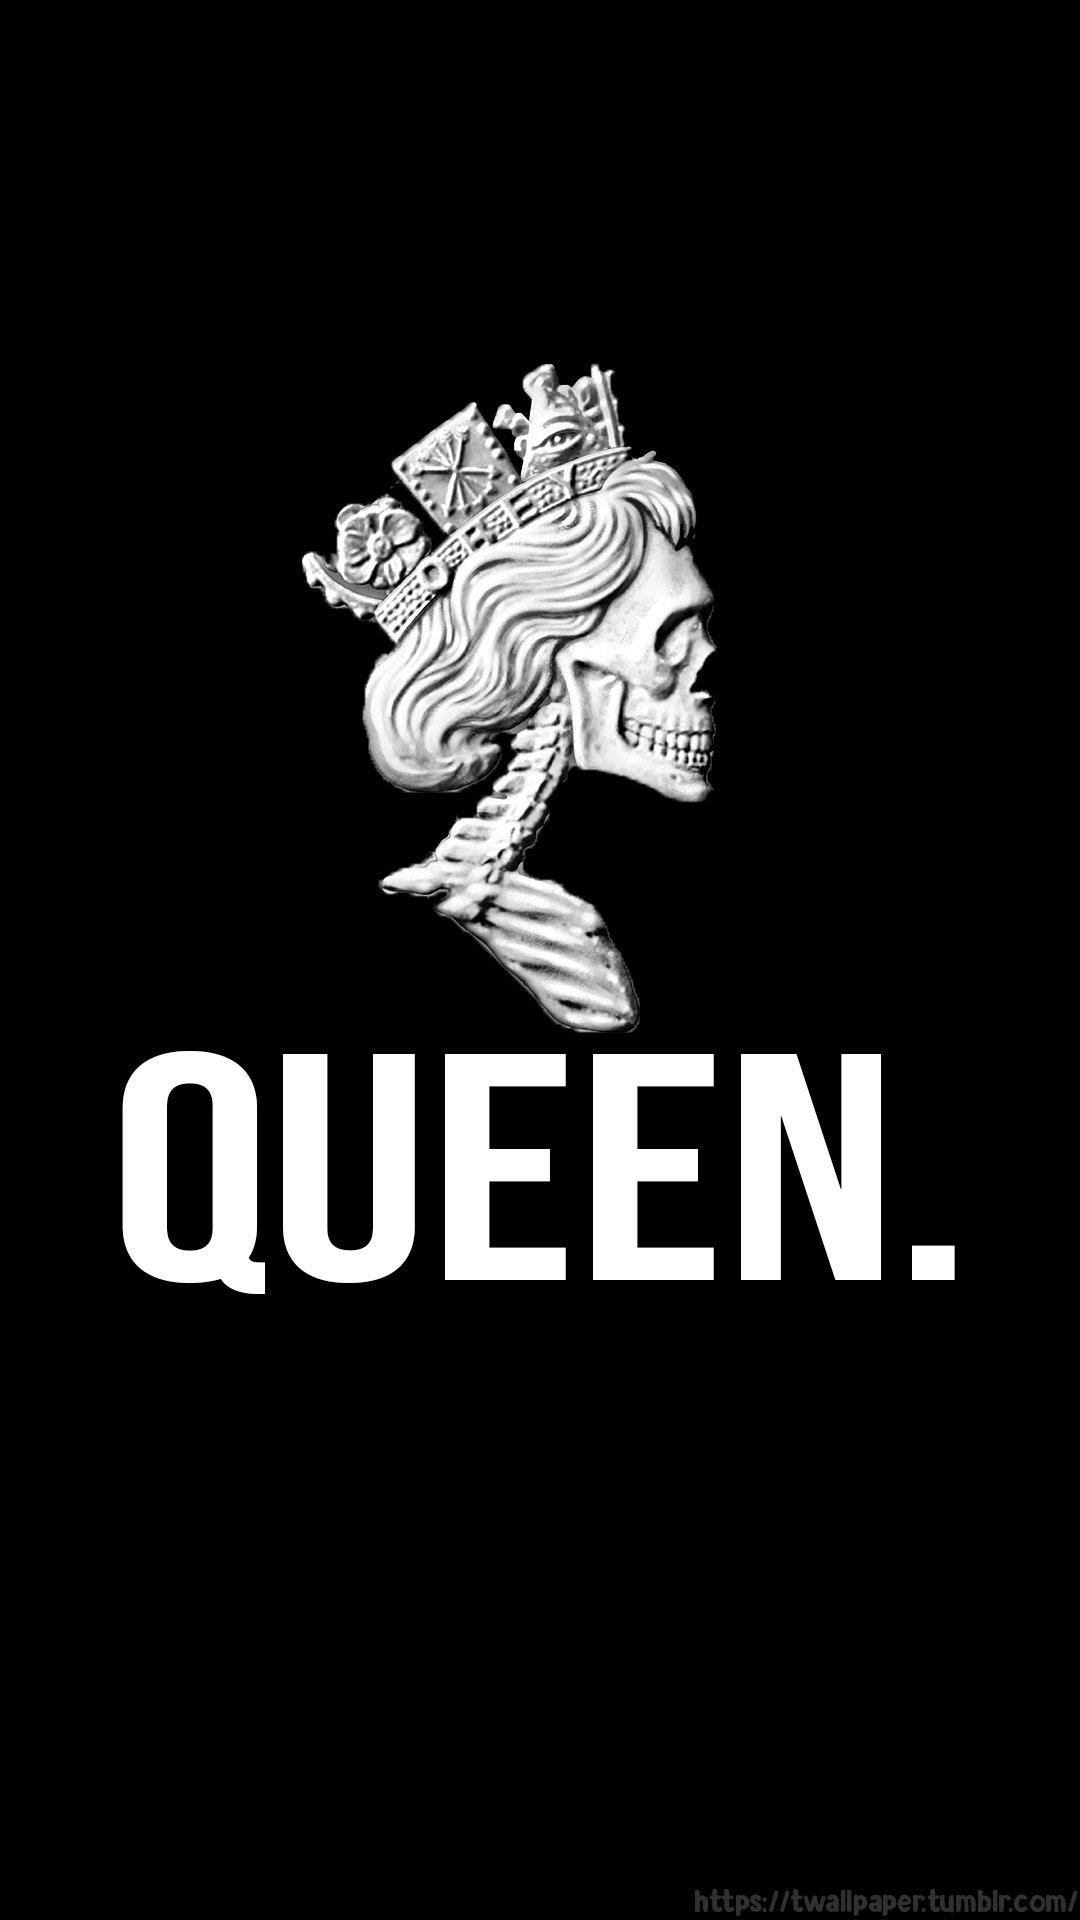 TWallpaper On Twitter King Tco NaoMC7Pyqa Queen 7W3MXpLOWO Donate Here YXC3jAoS61 Rey Reina